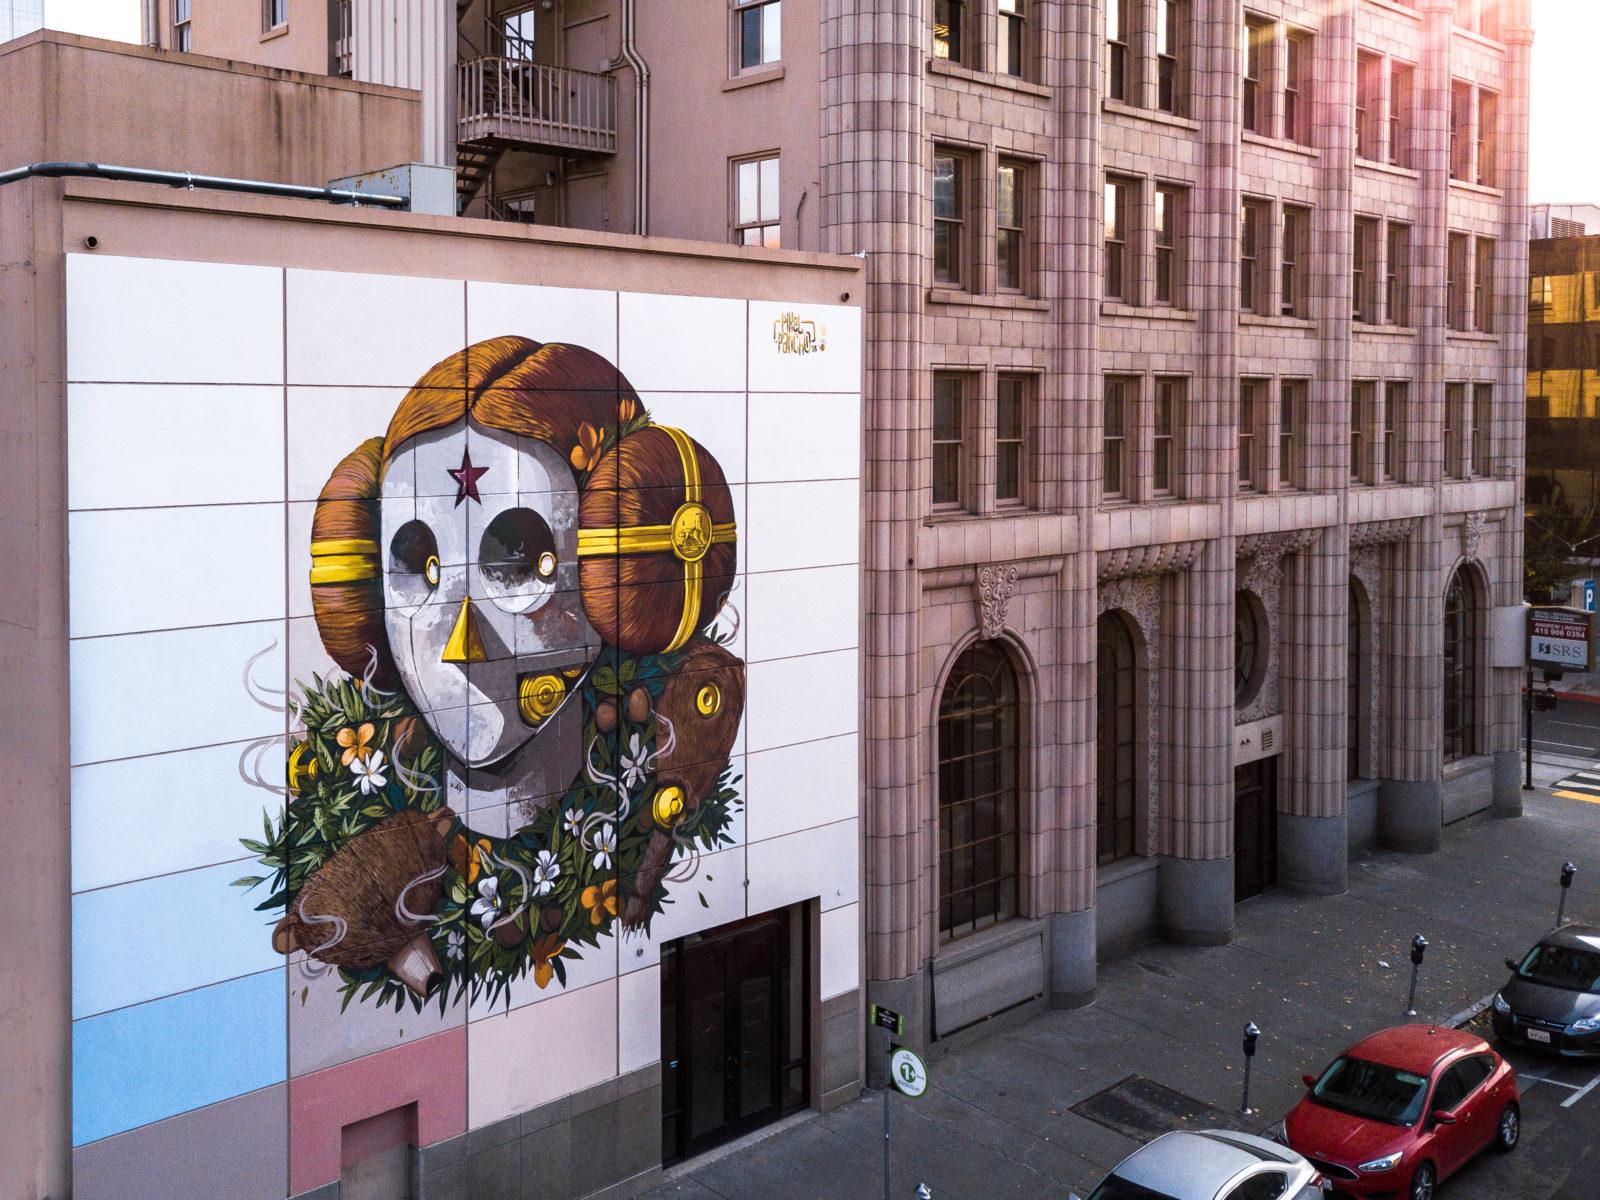 street art wide open walls sacramento californie USA festival mural Pixel Pancho  MERO radar - Les 10 murales les plus marquantes du festival Wide Open Walls Sacramento